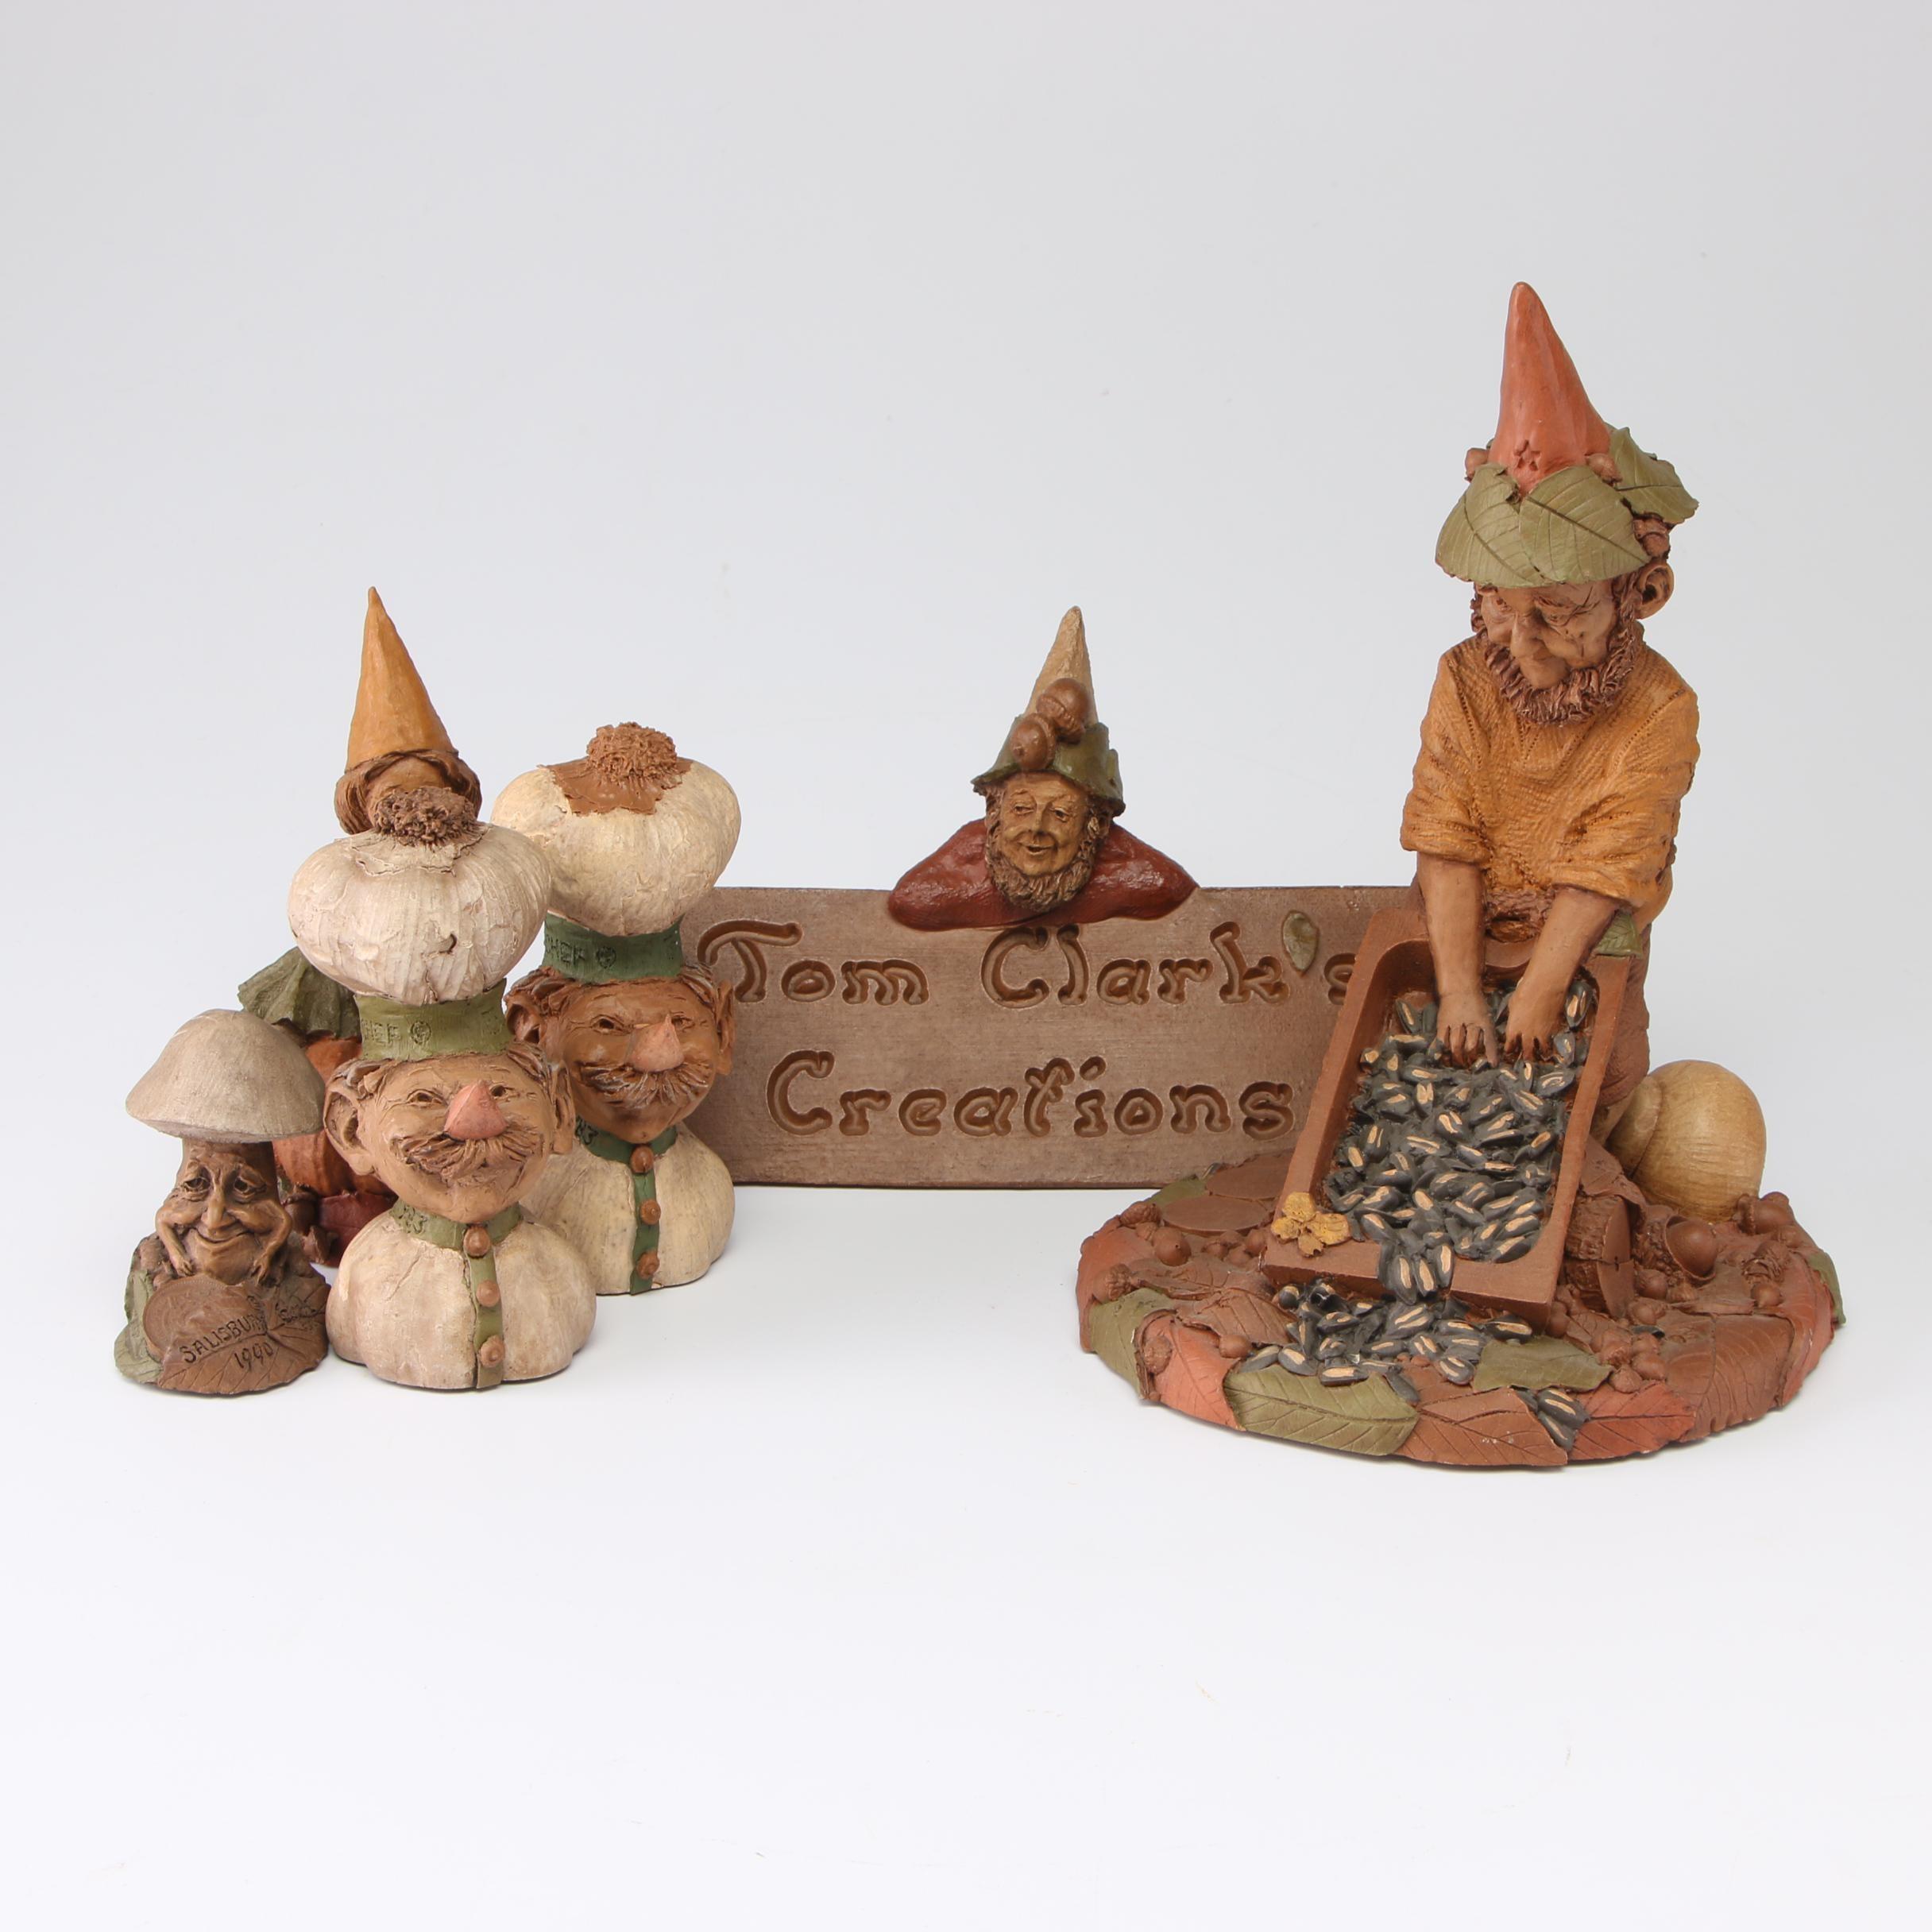 Tom Clark Gnome Pecan Resin Figurines